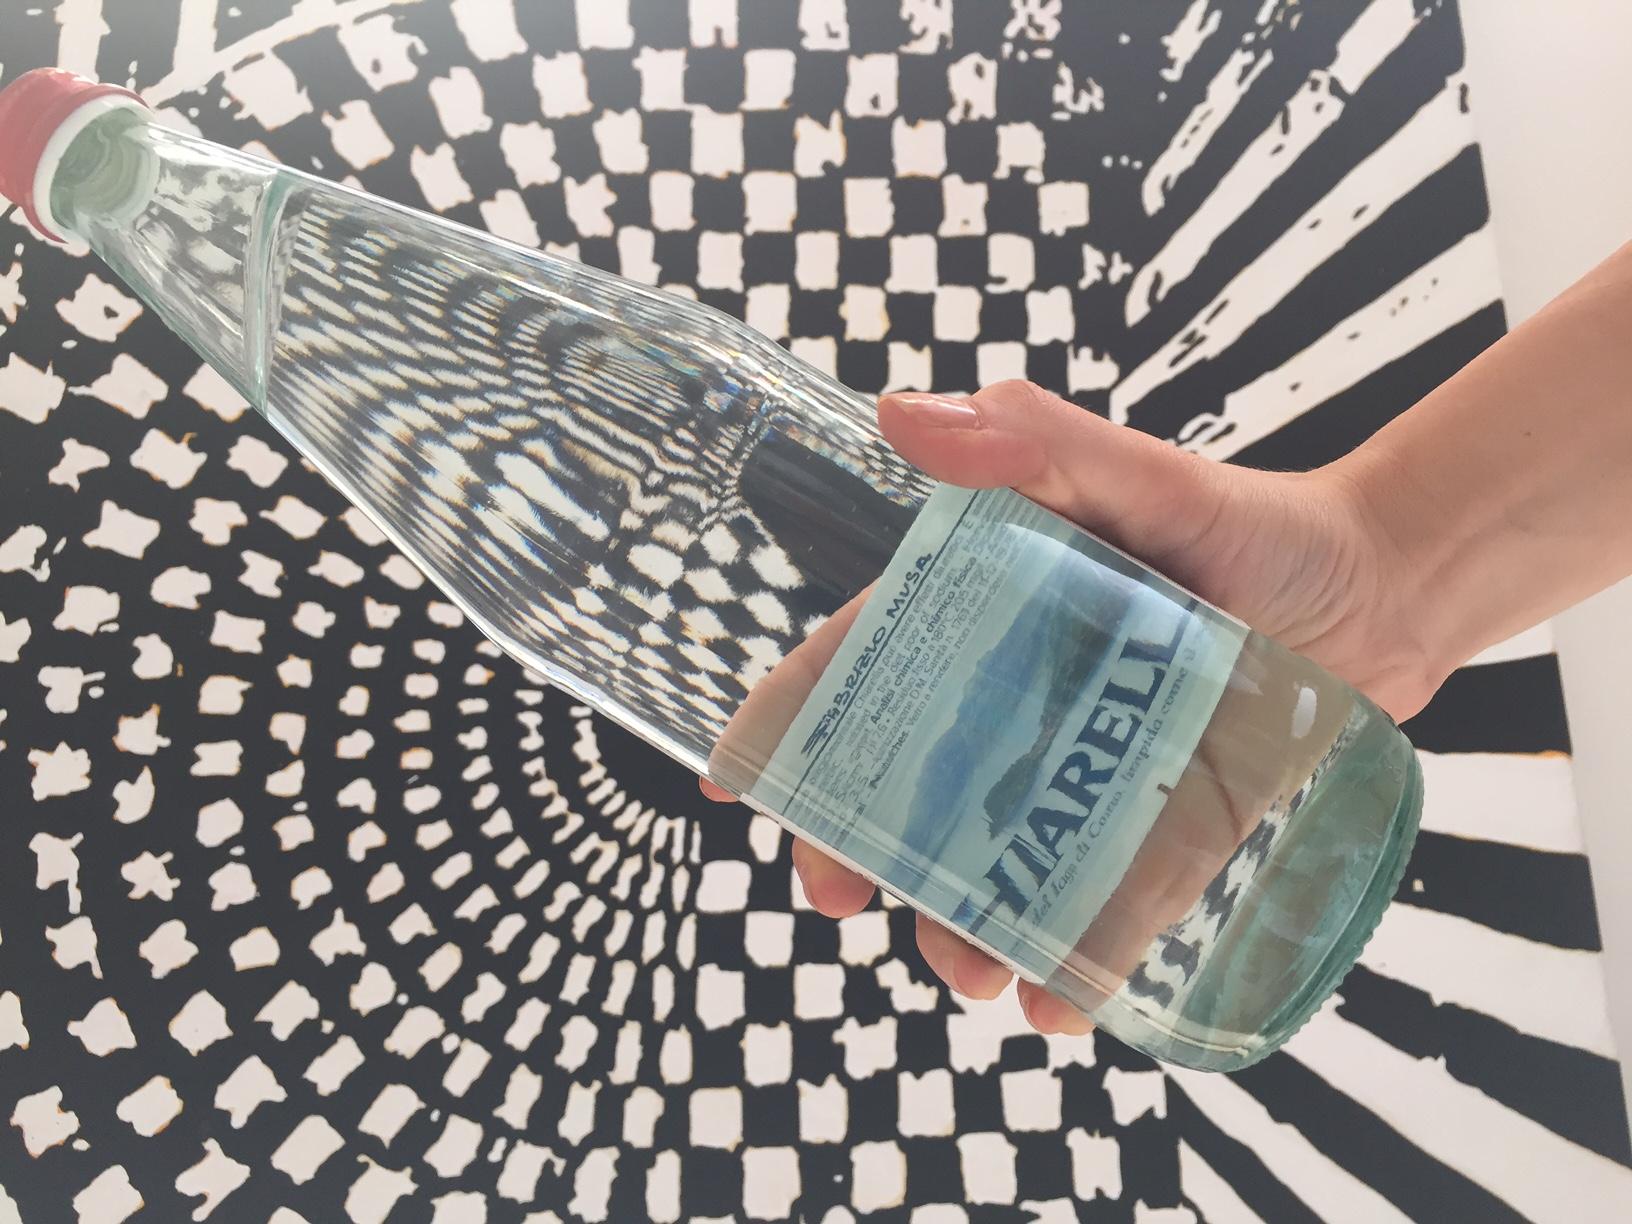 Bottiglie in limited edition